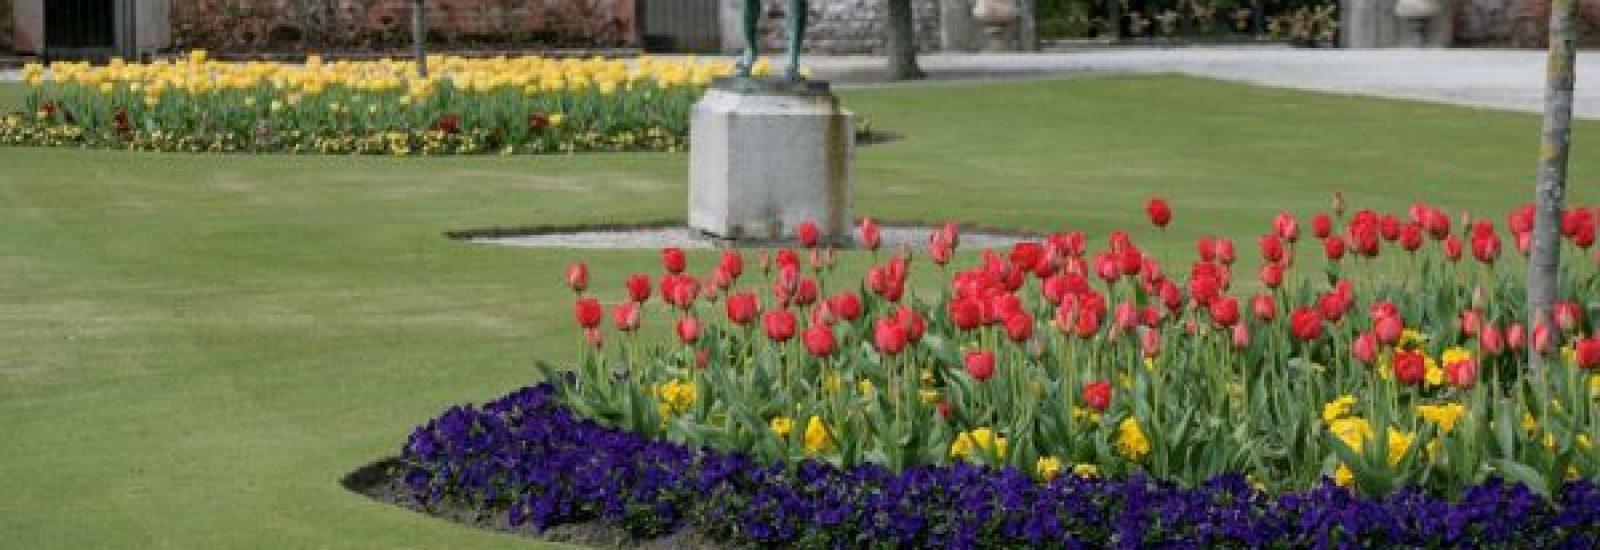 The Annual Tulip Festival at Powerscourt Gardens